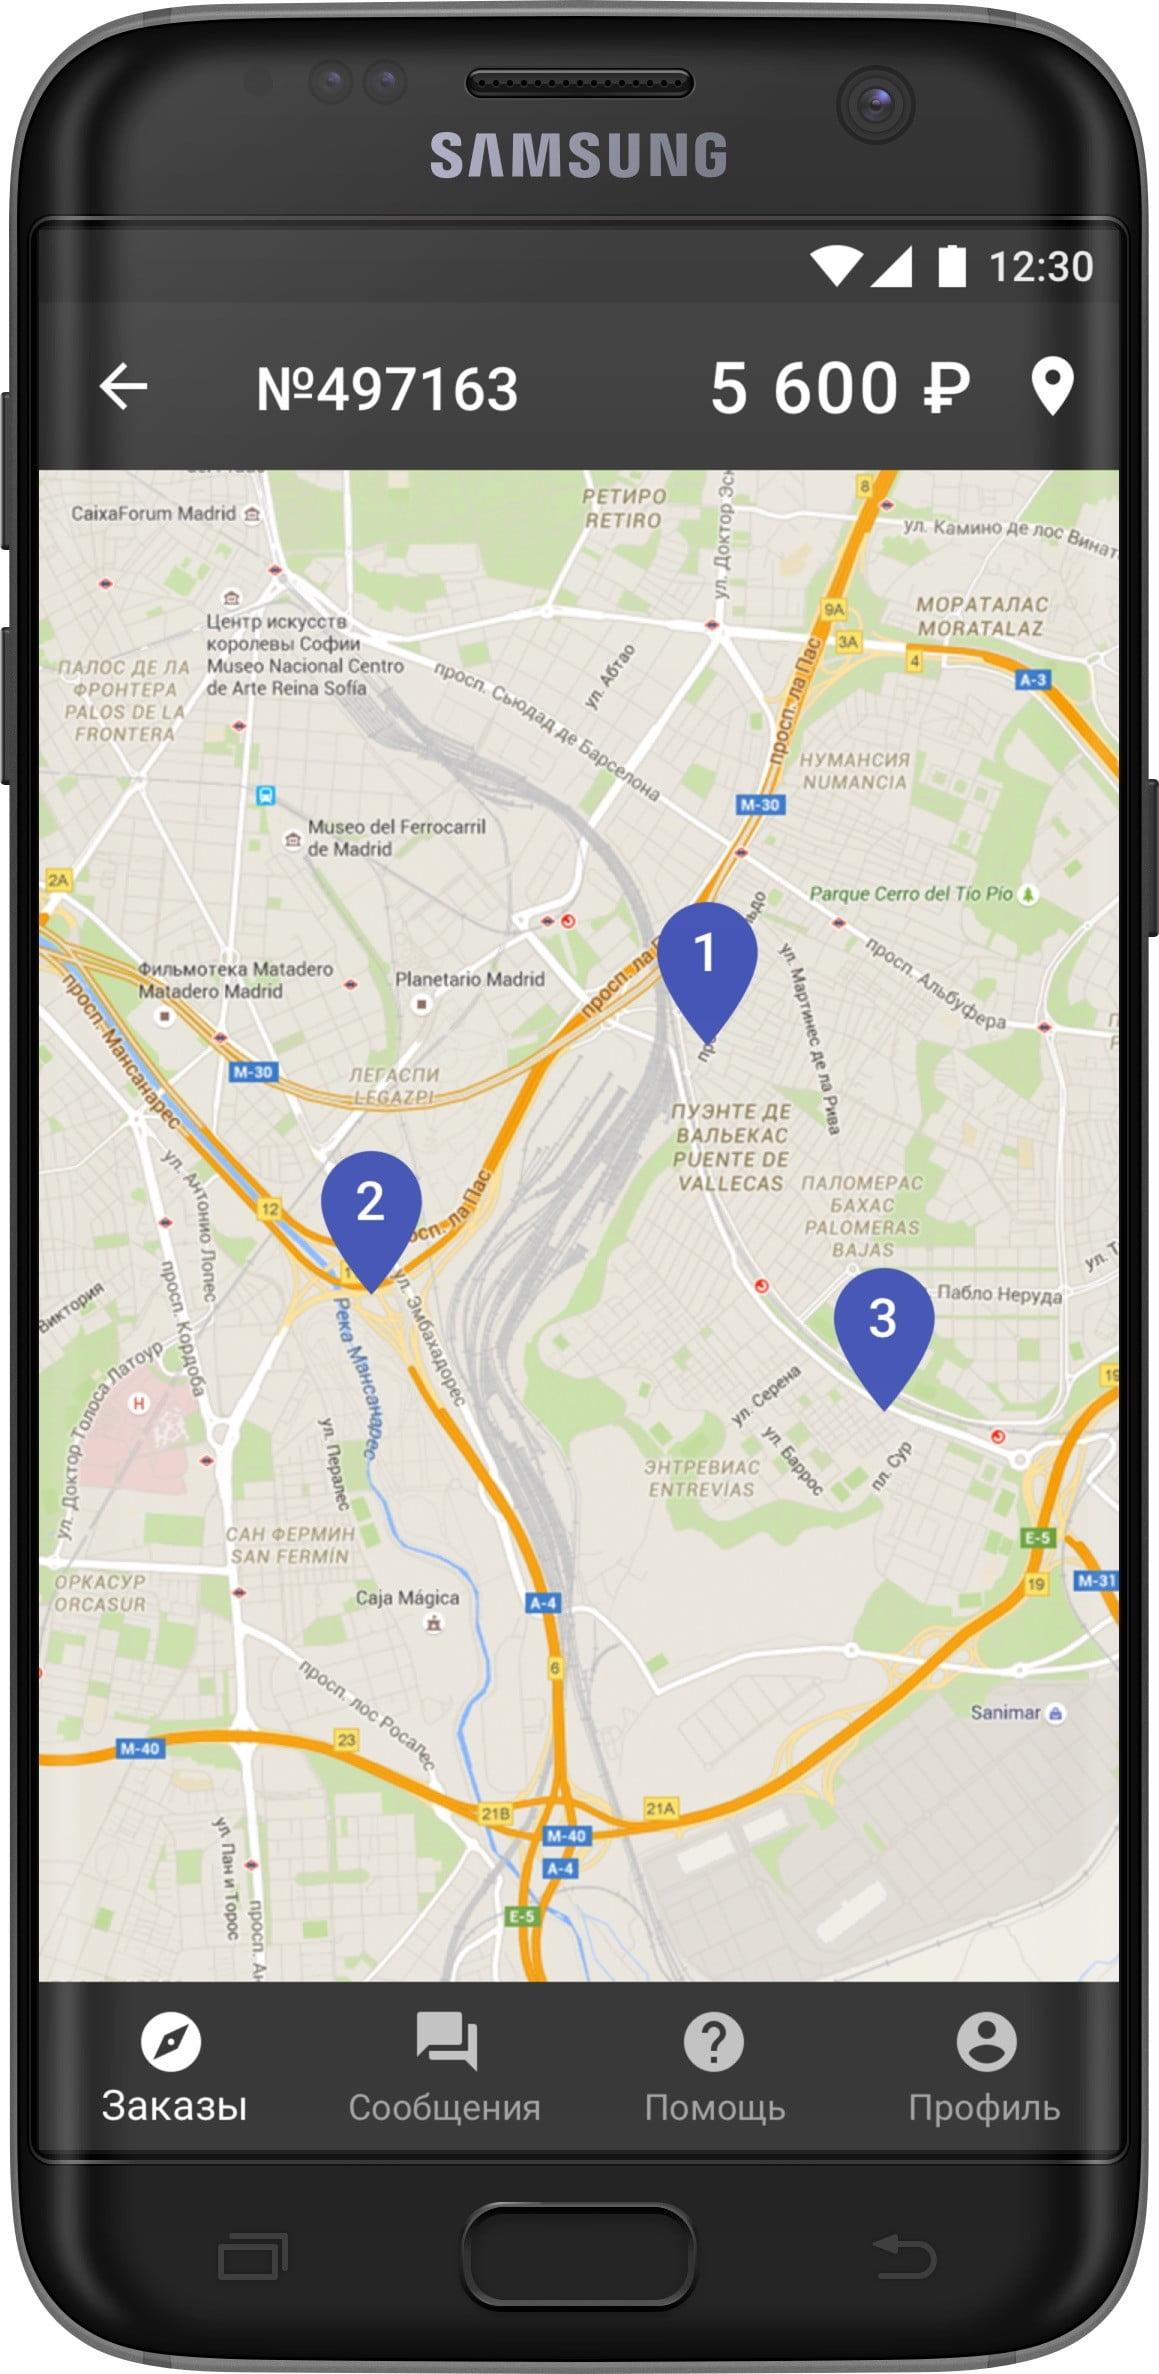 Интерфейс Fierly Express Сайт Артура Нецветаева — сайты, приложения, прототипы и оформление интерфейсов fierly android app 3 by artur netsvetaev design